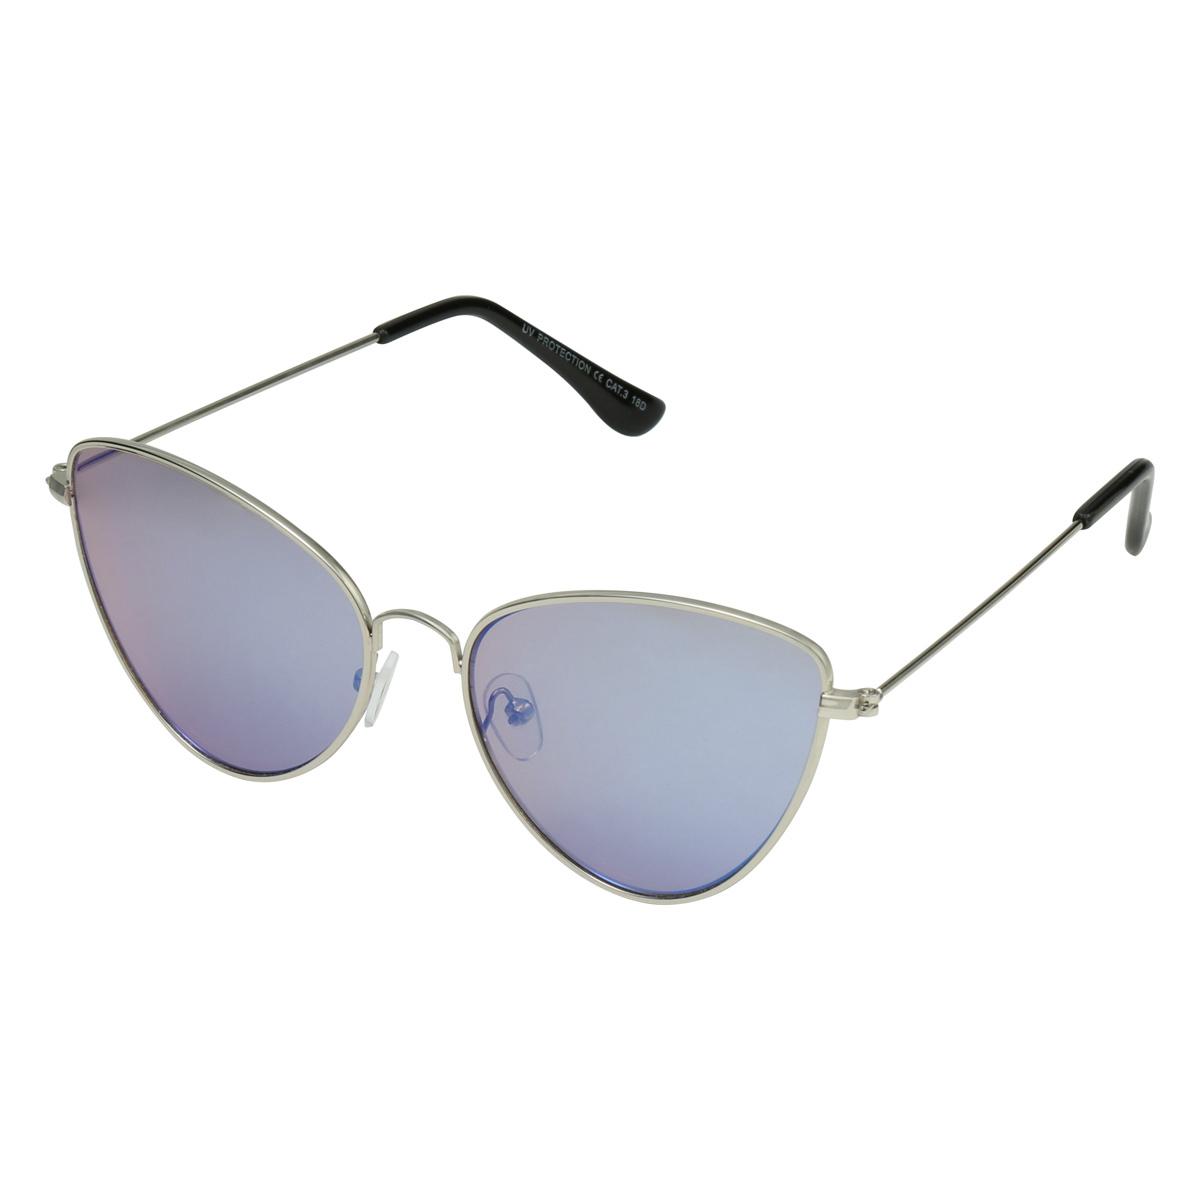 Sunglasses Marilyn